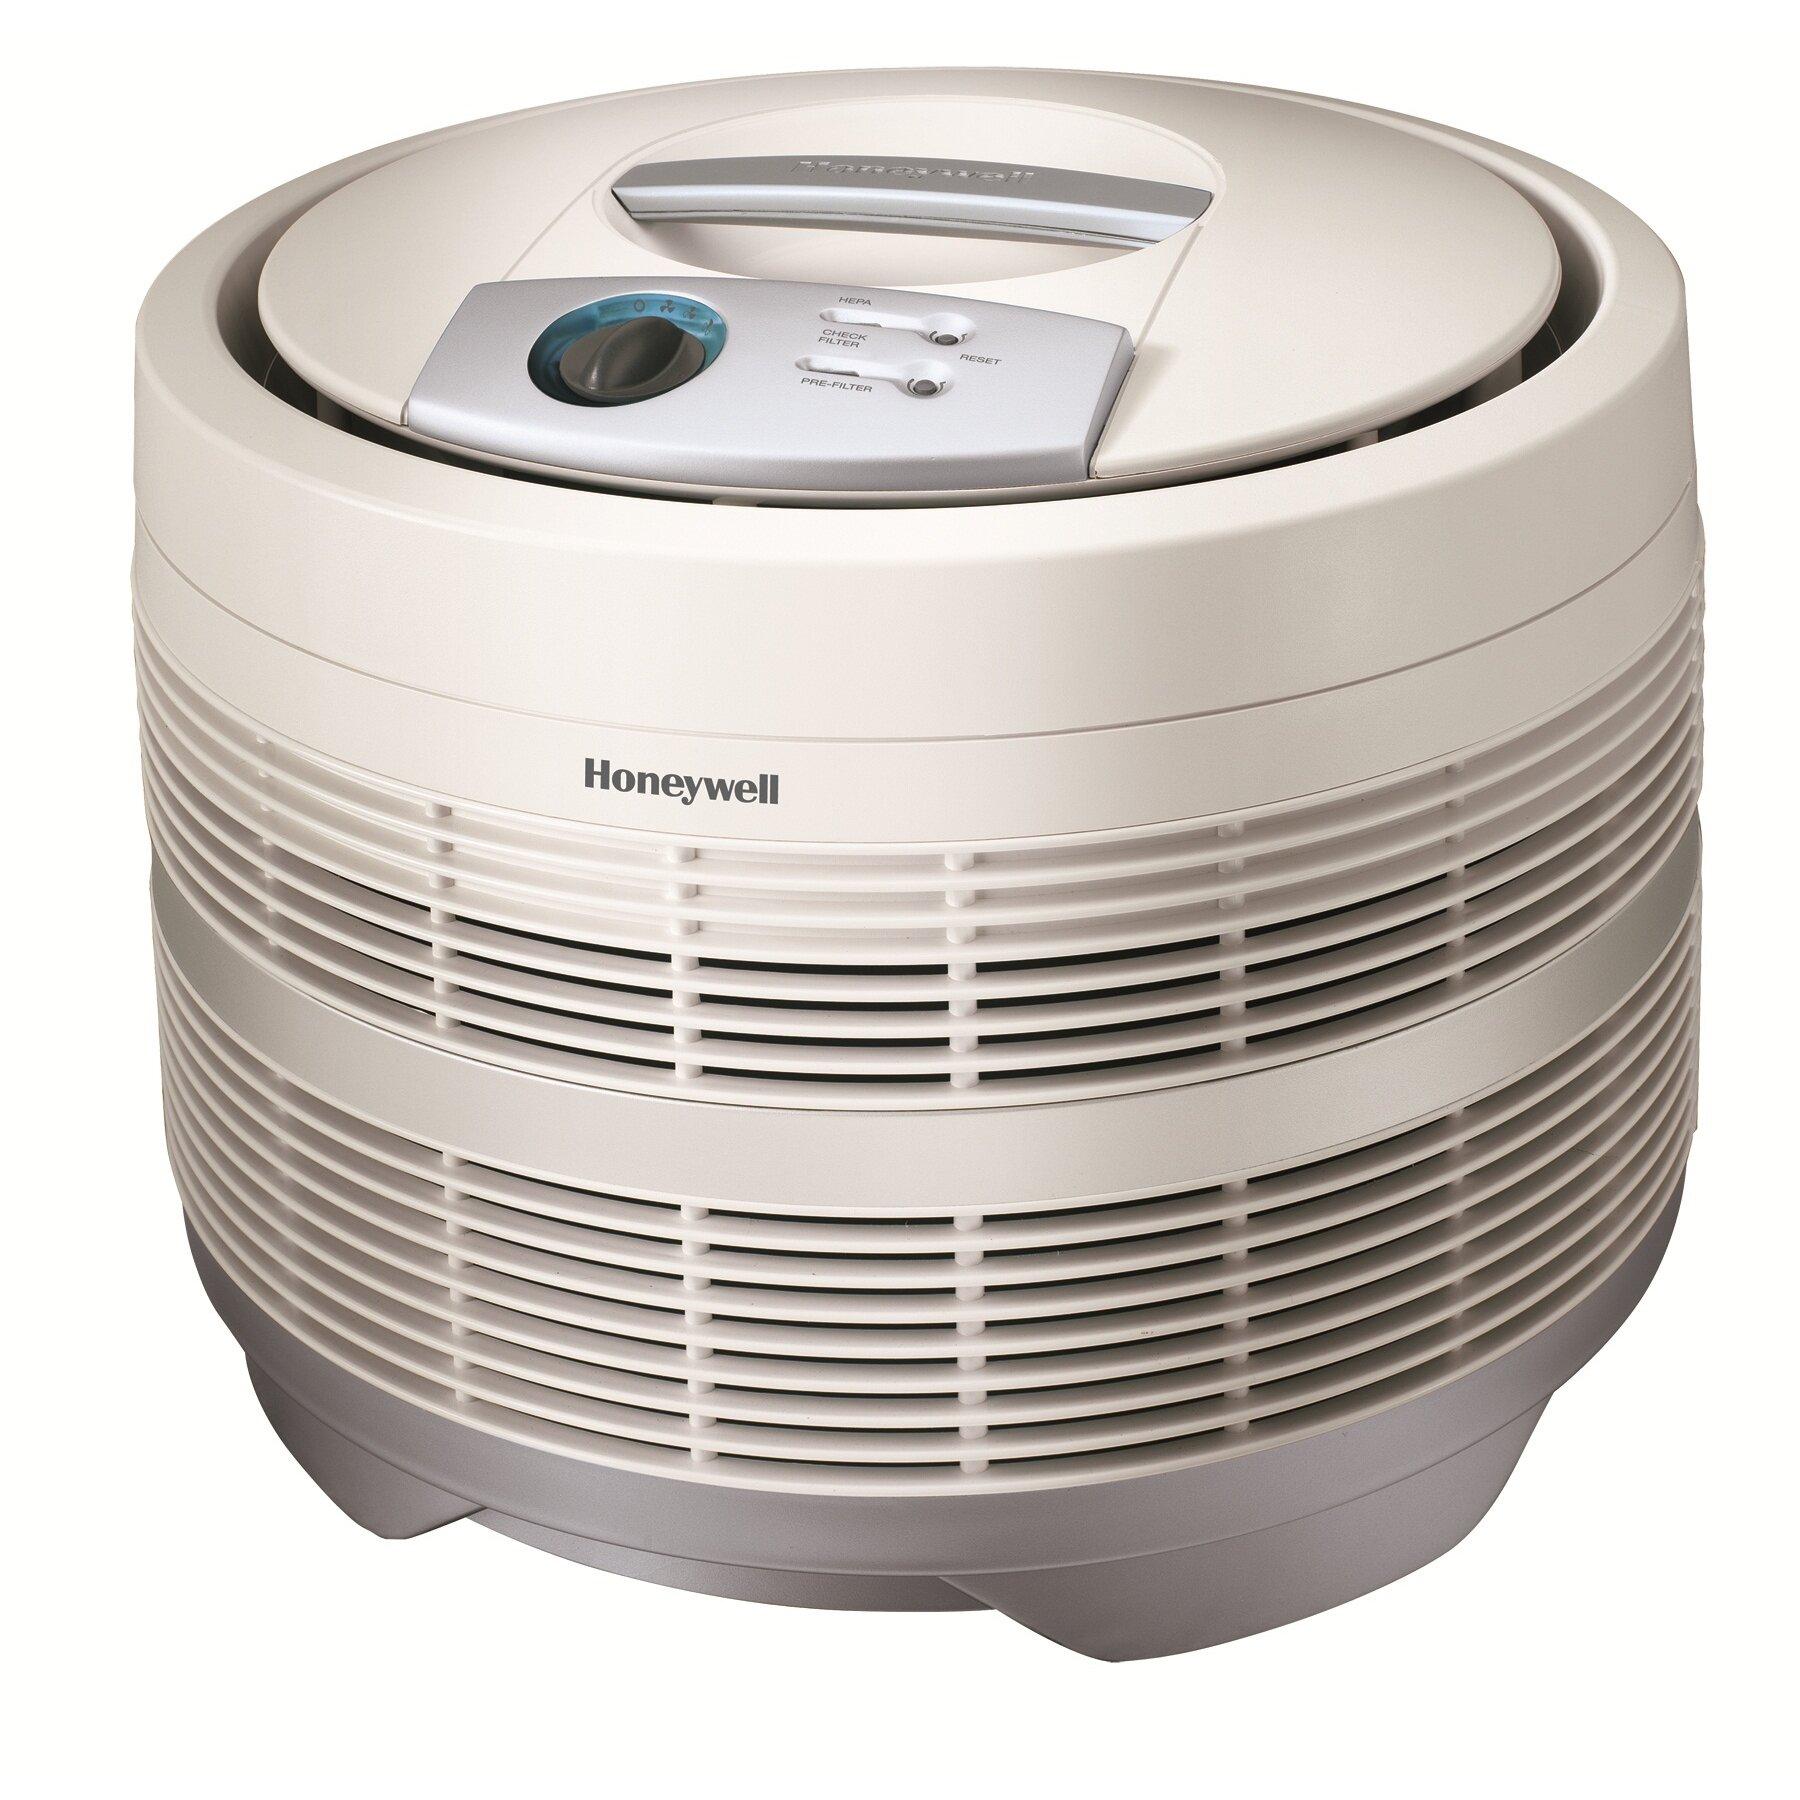 Honeywell Room True Hepa Air Purifier Reviews